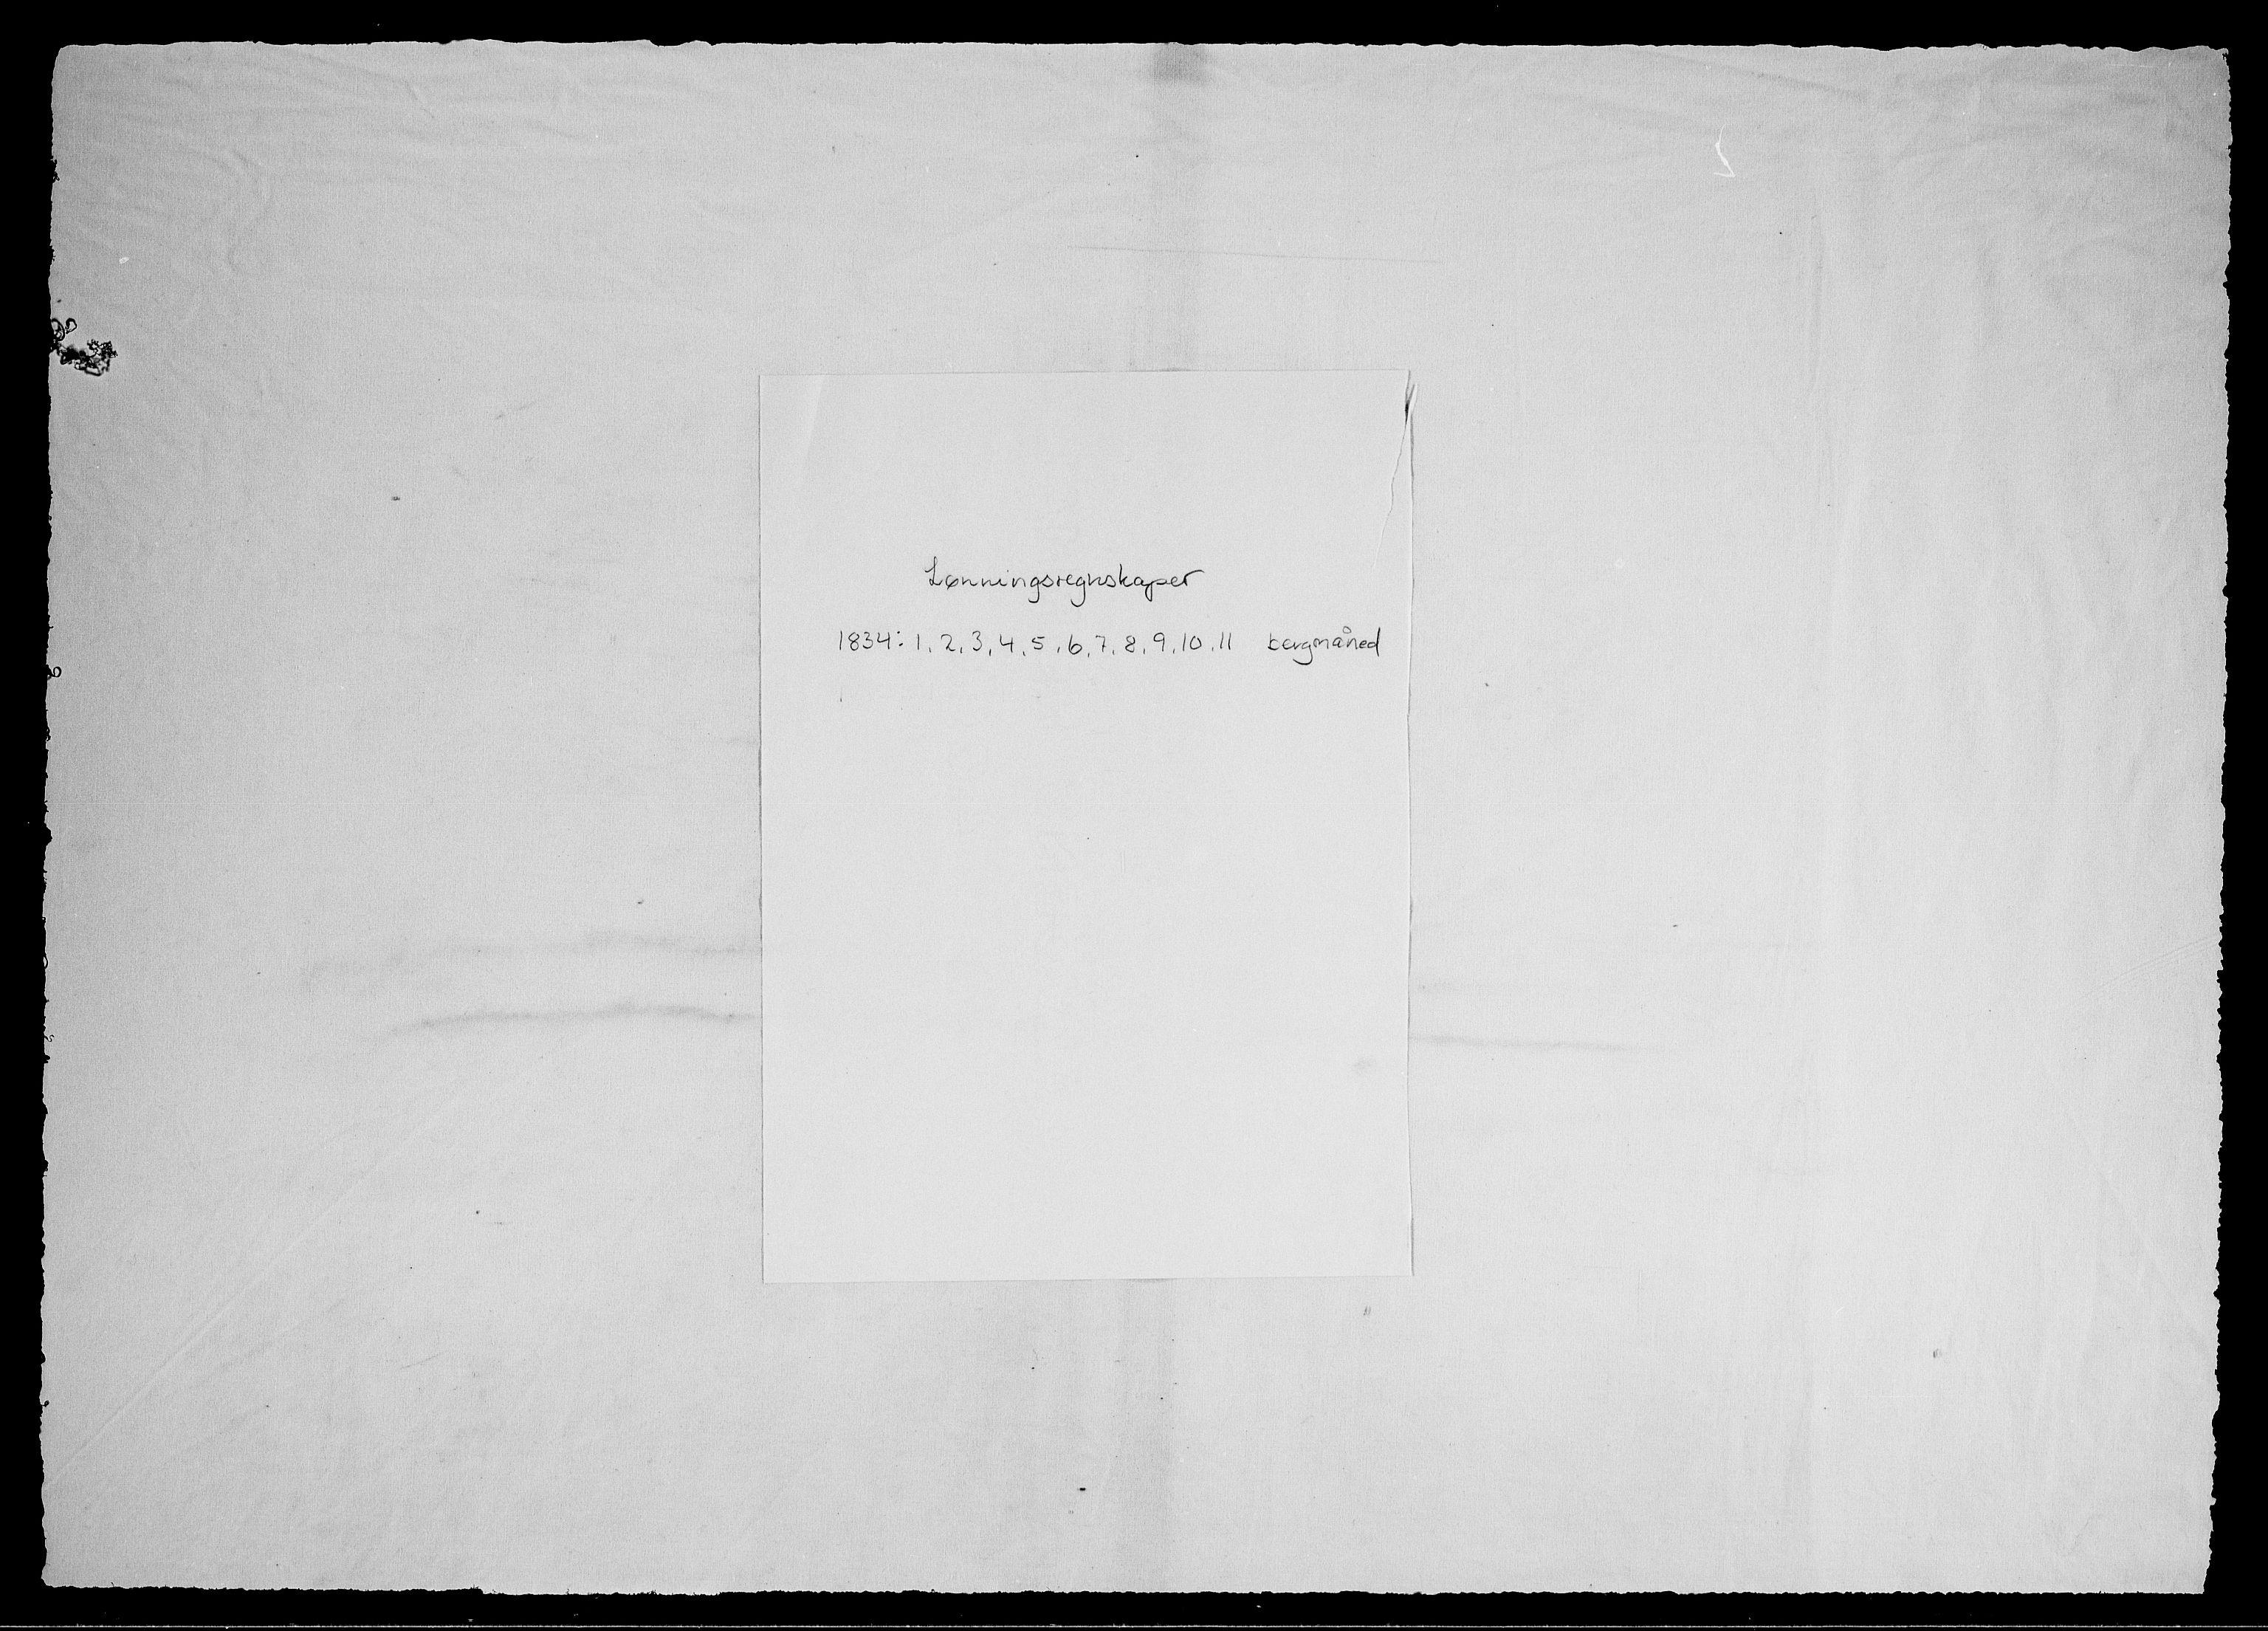 RA, Modums Blaafarveværk, G/Gd/Gdd/L0274, 1834, s. 2